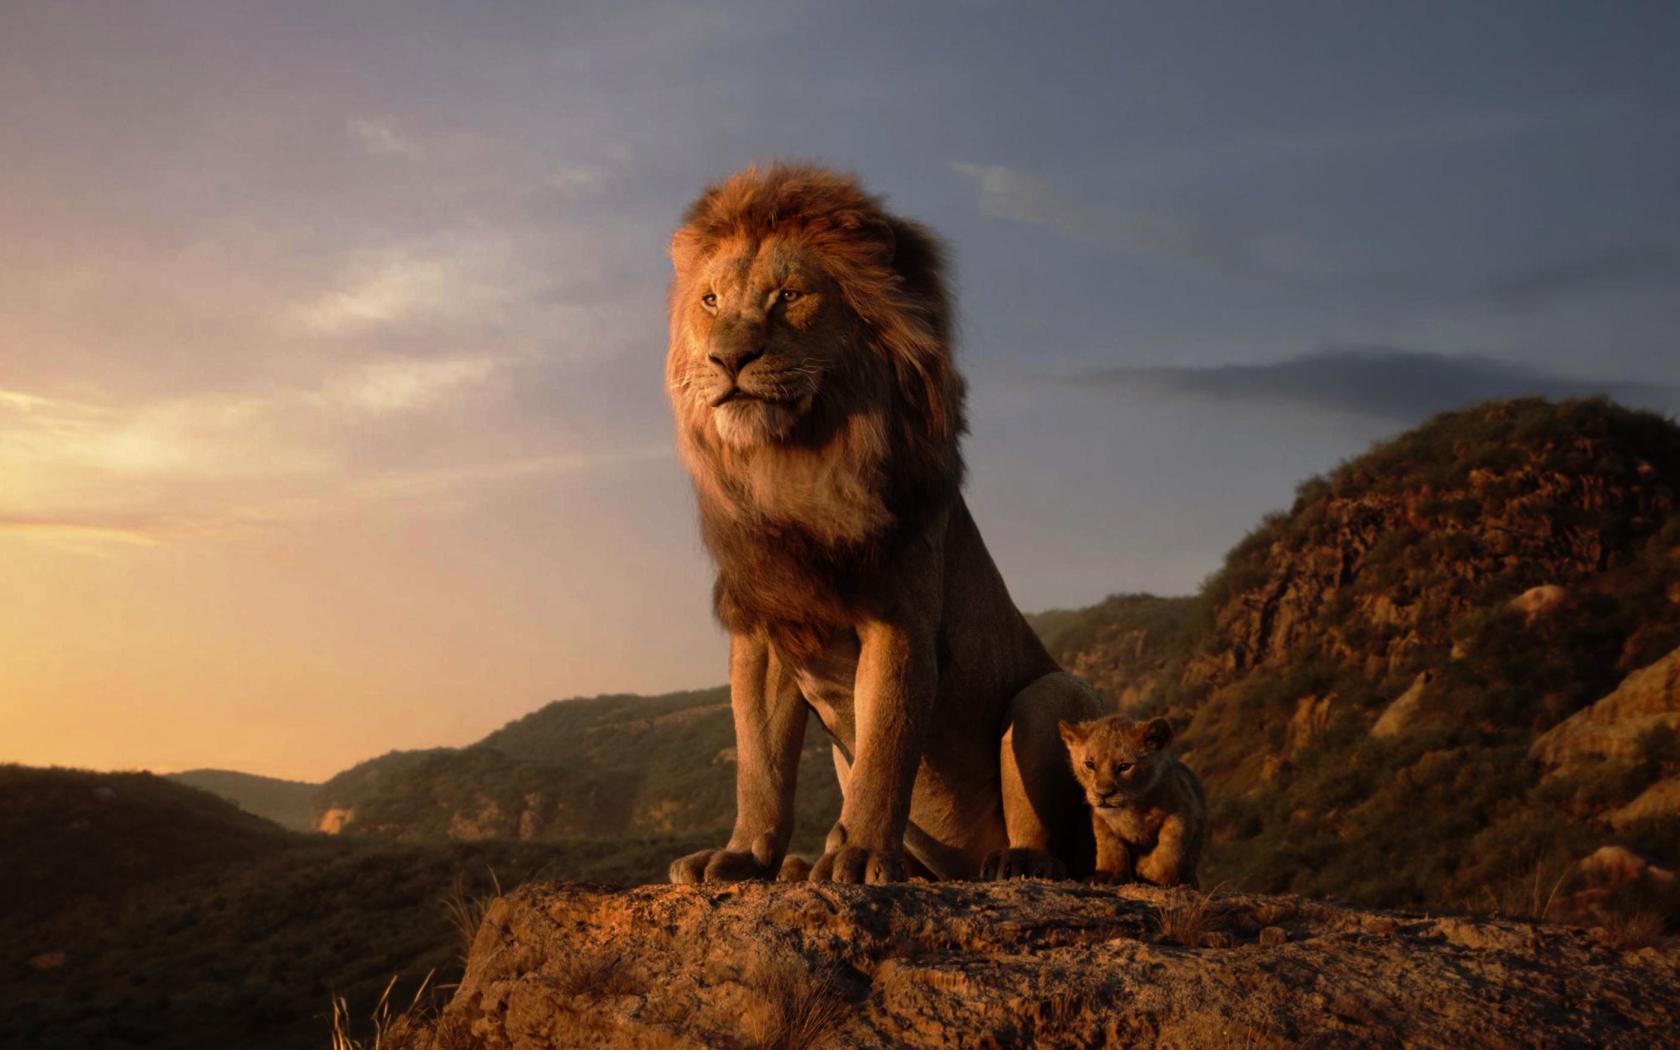 1680x1050 The Lion King 1680x1050 Resolution Wallpaper, HD ...